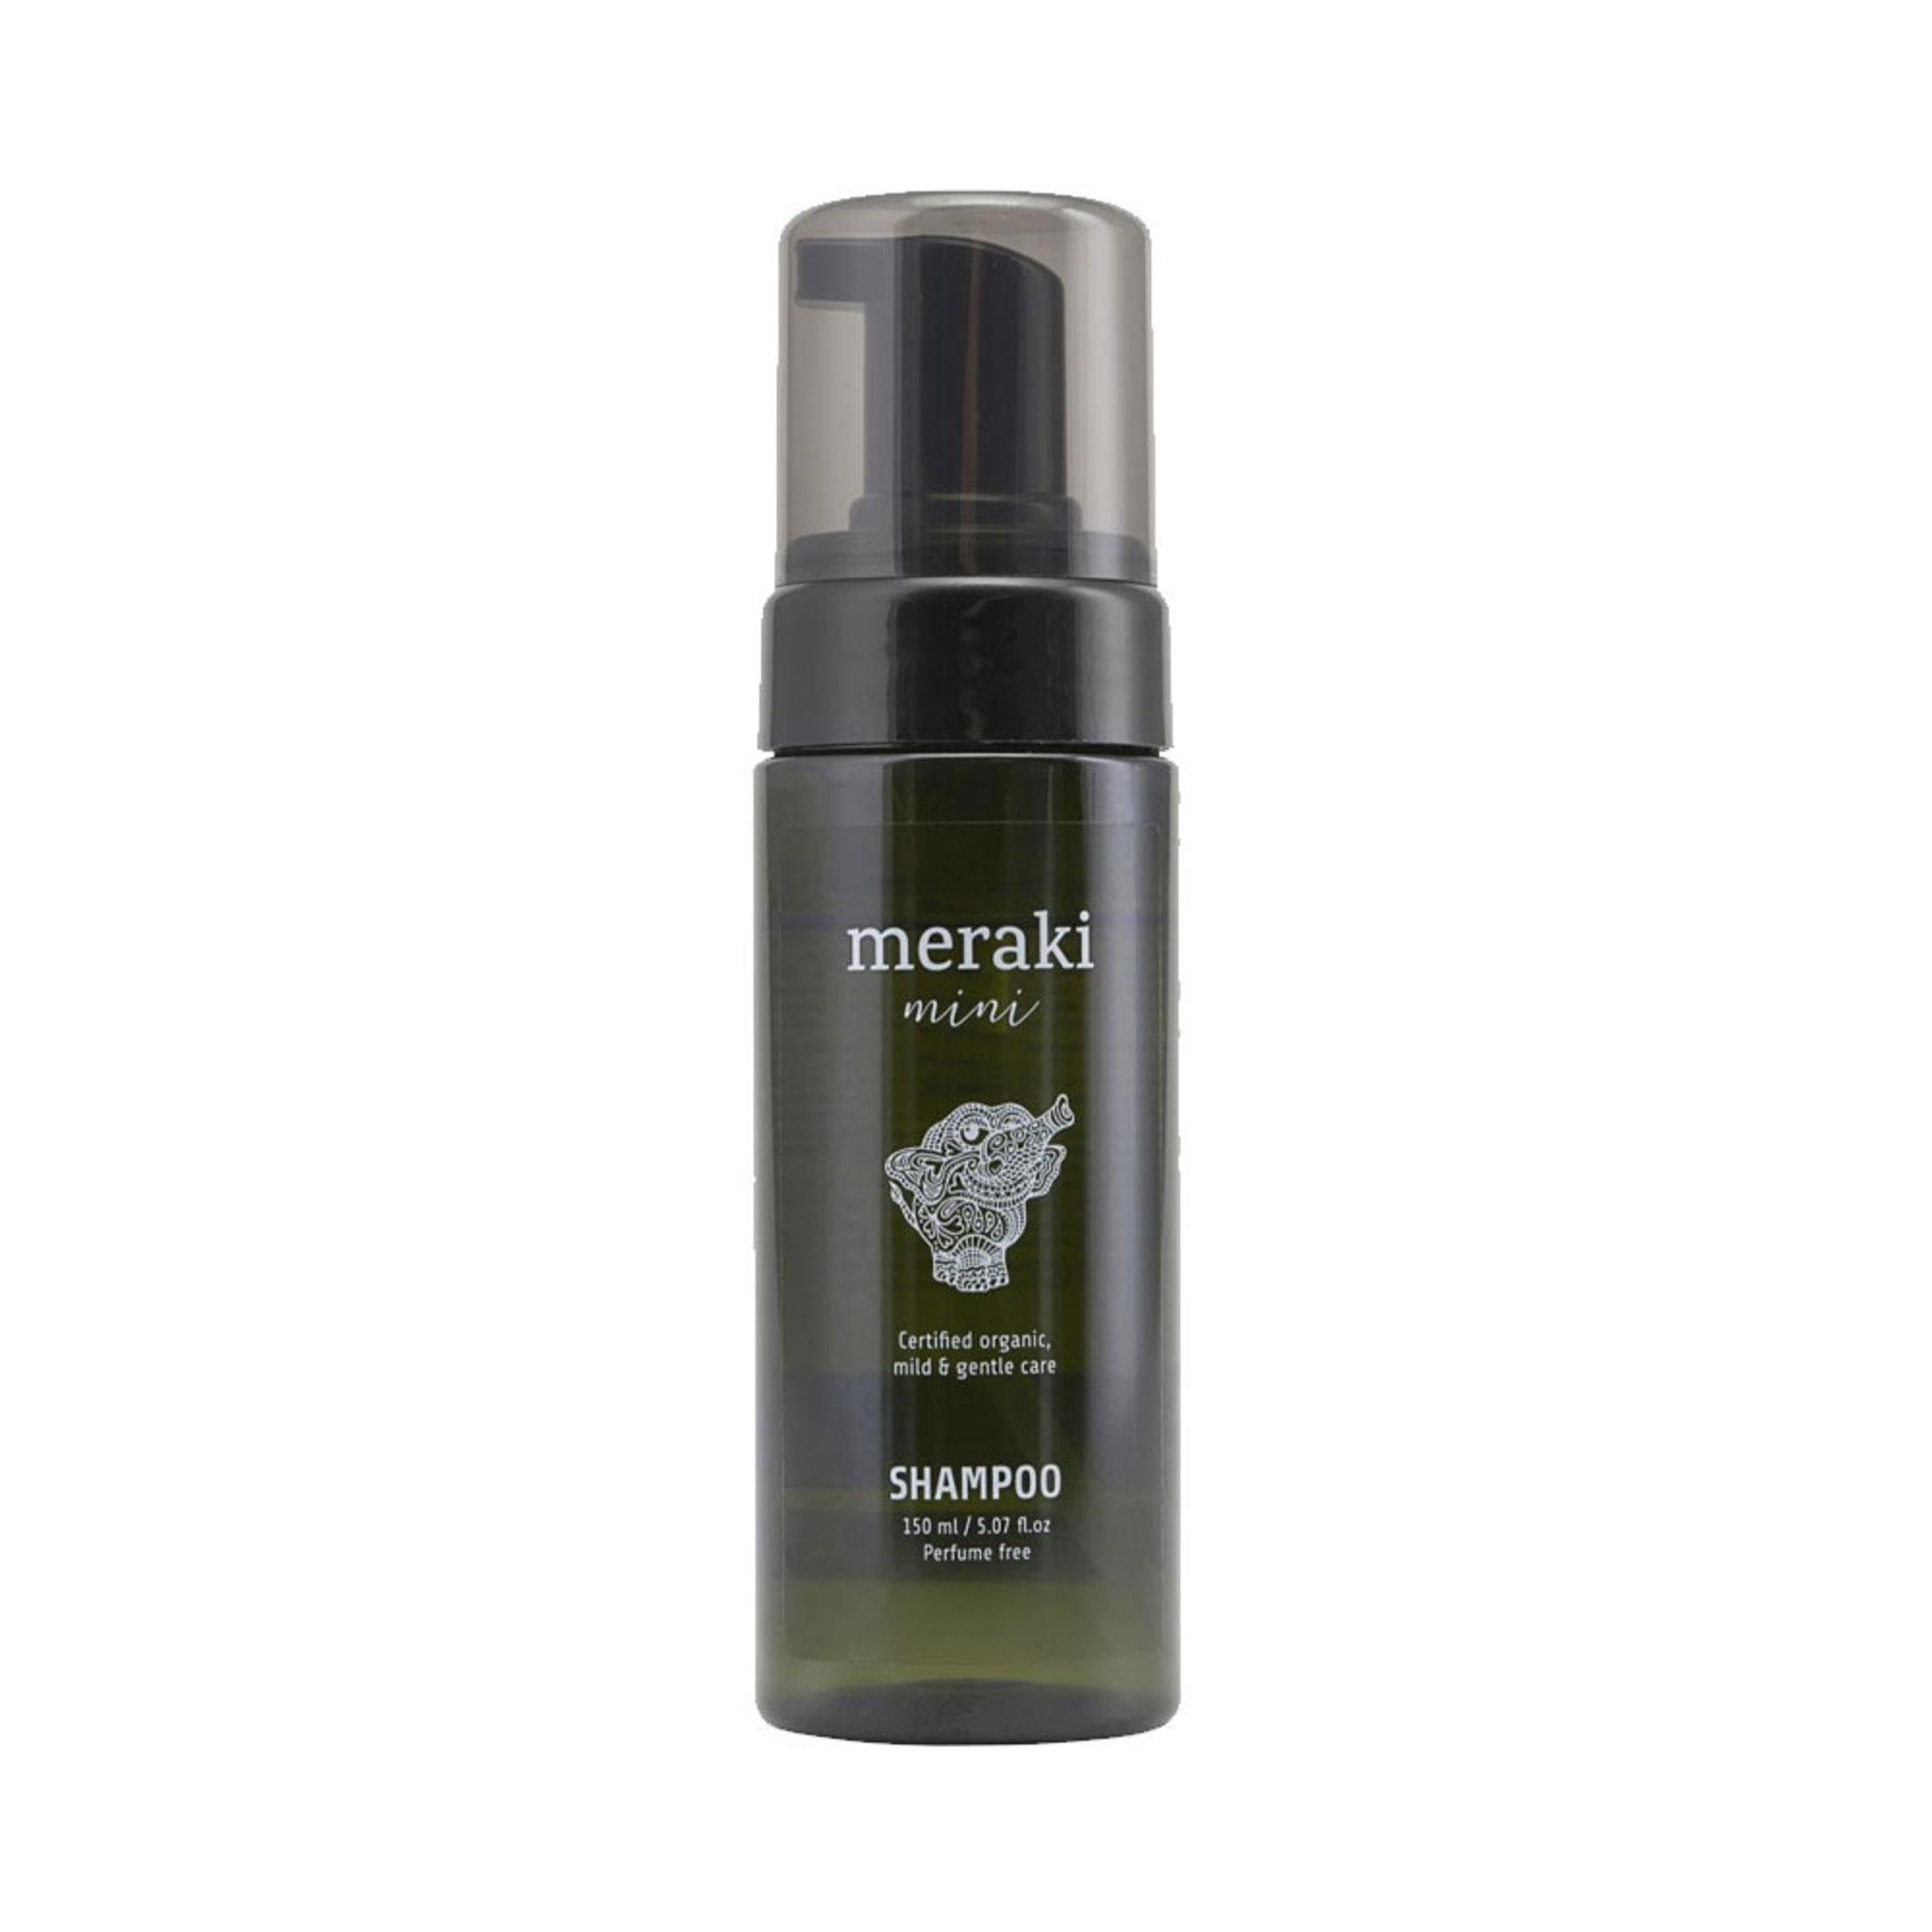 Shampoo, Mini, 150 ml